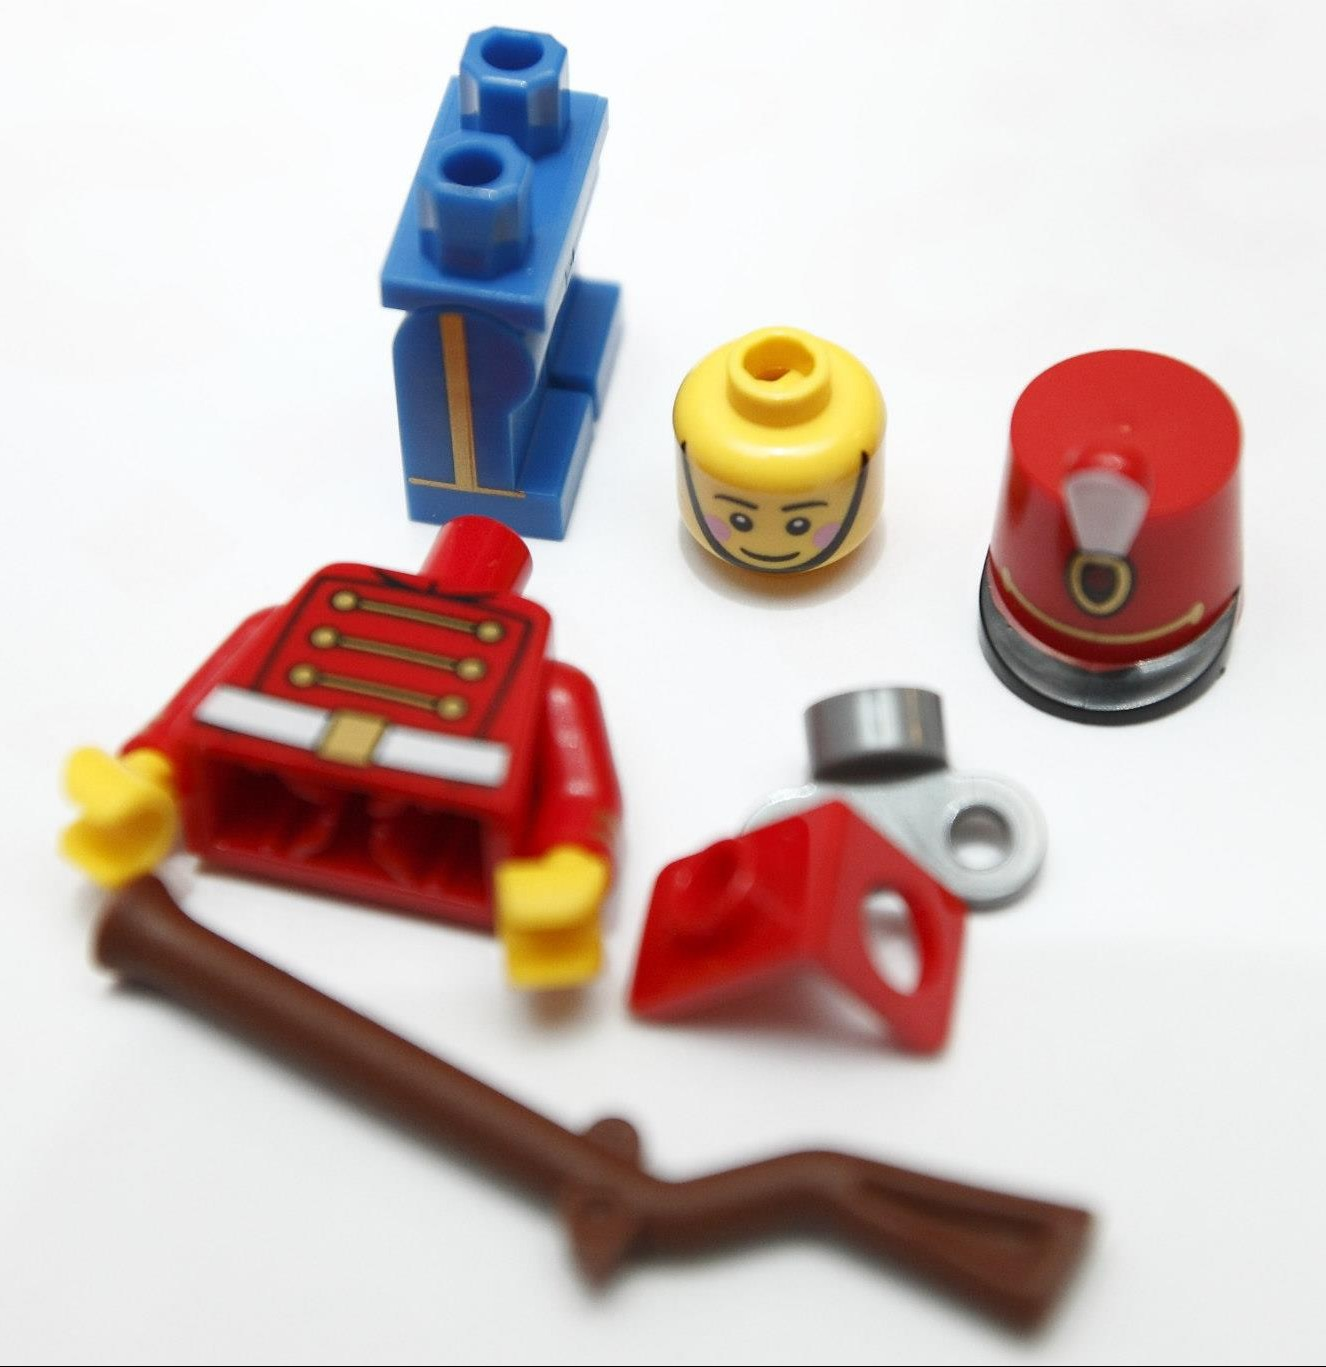 Lego Figures Toys : Lego minifigures character encylopedia exclusive toy